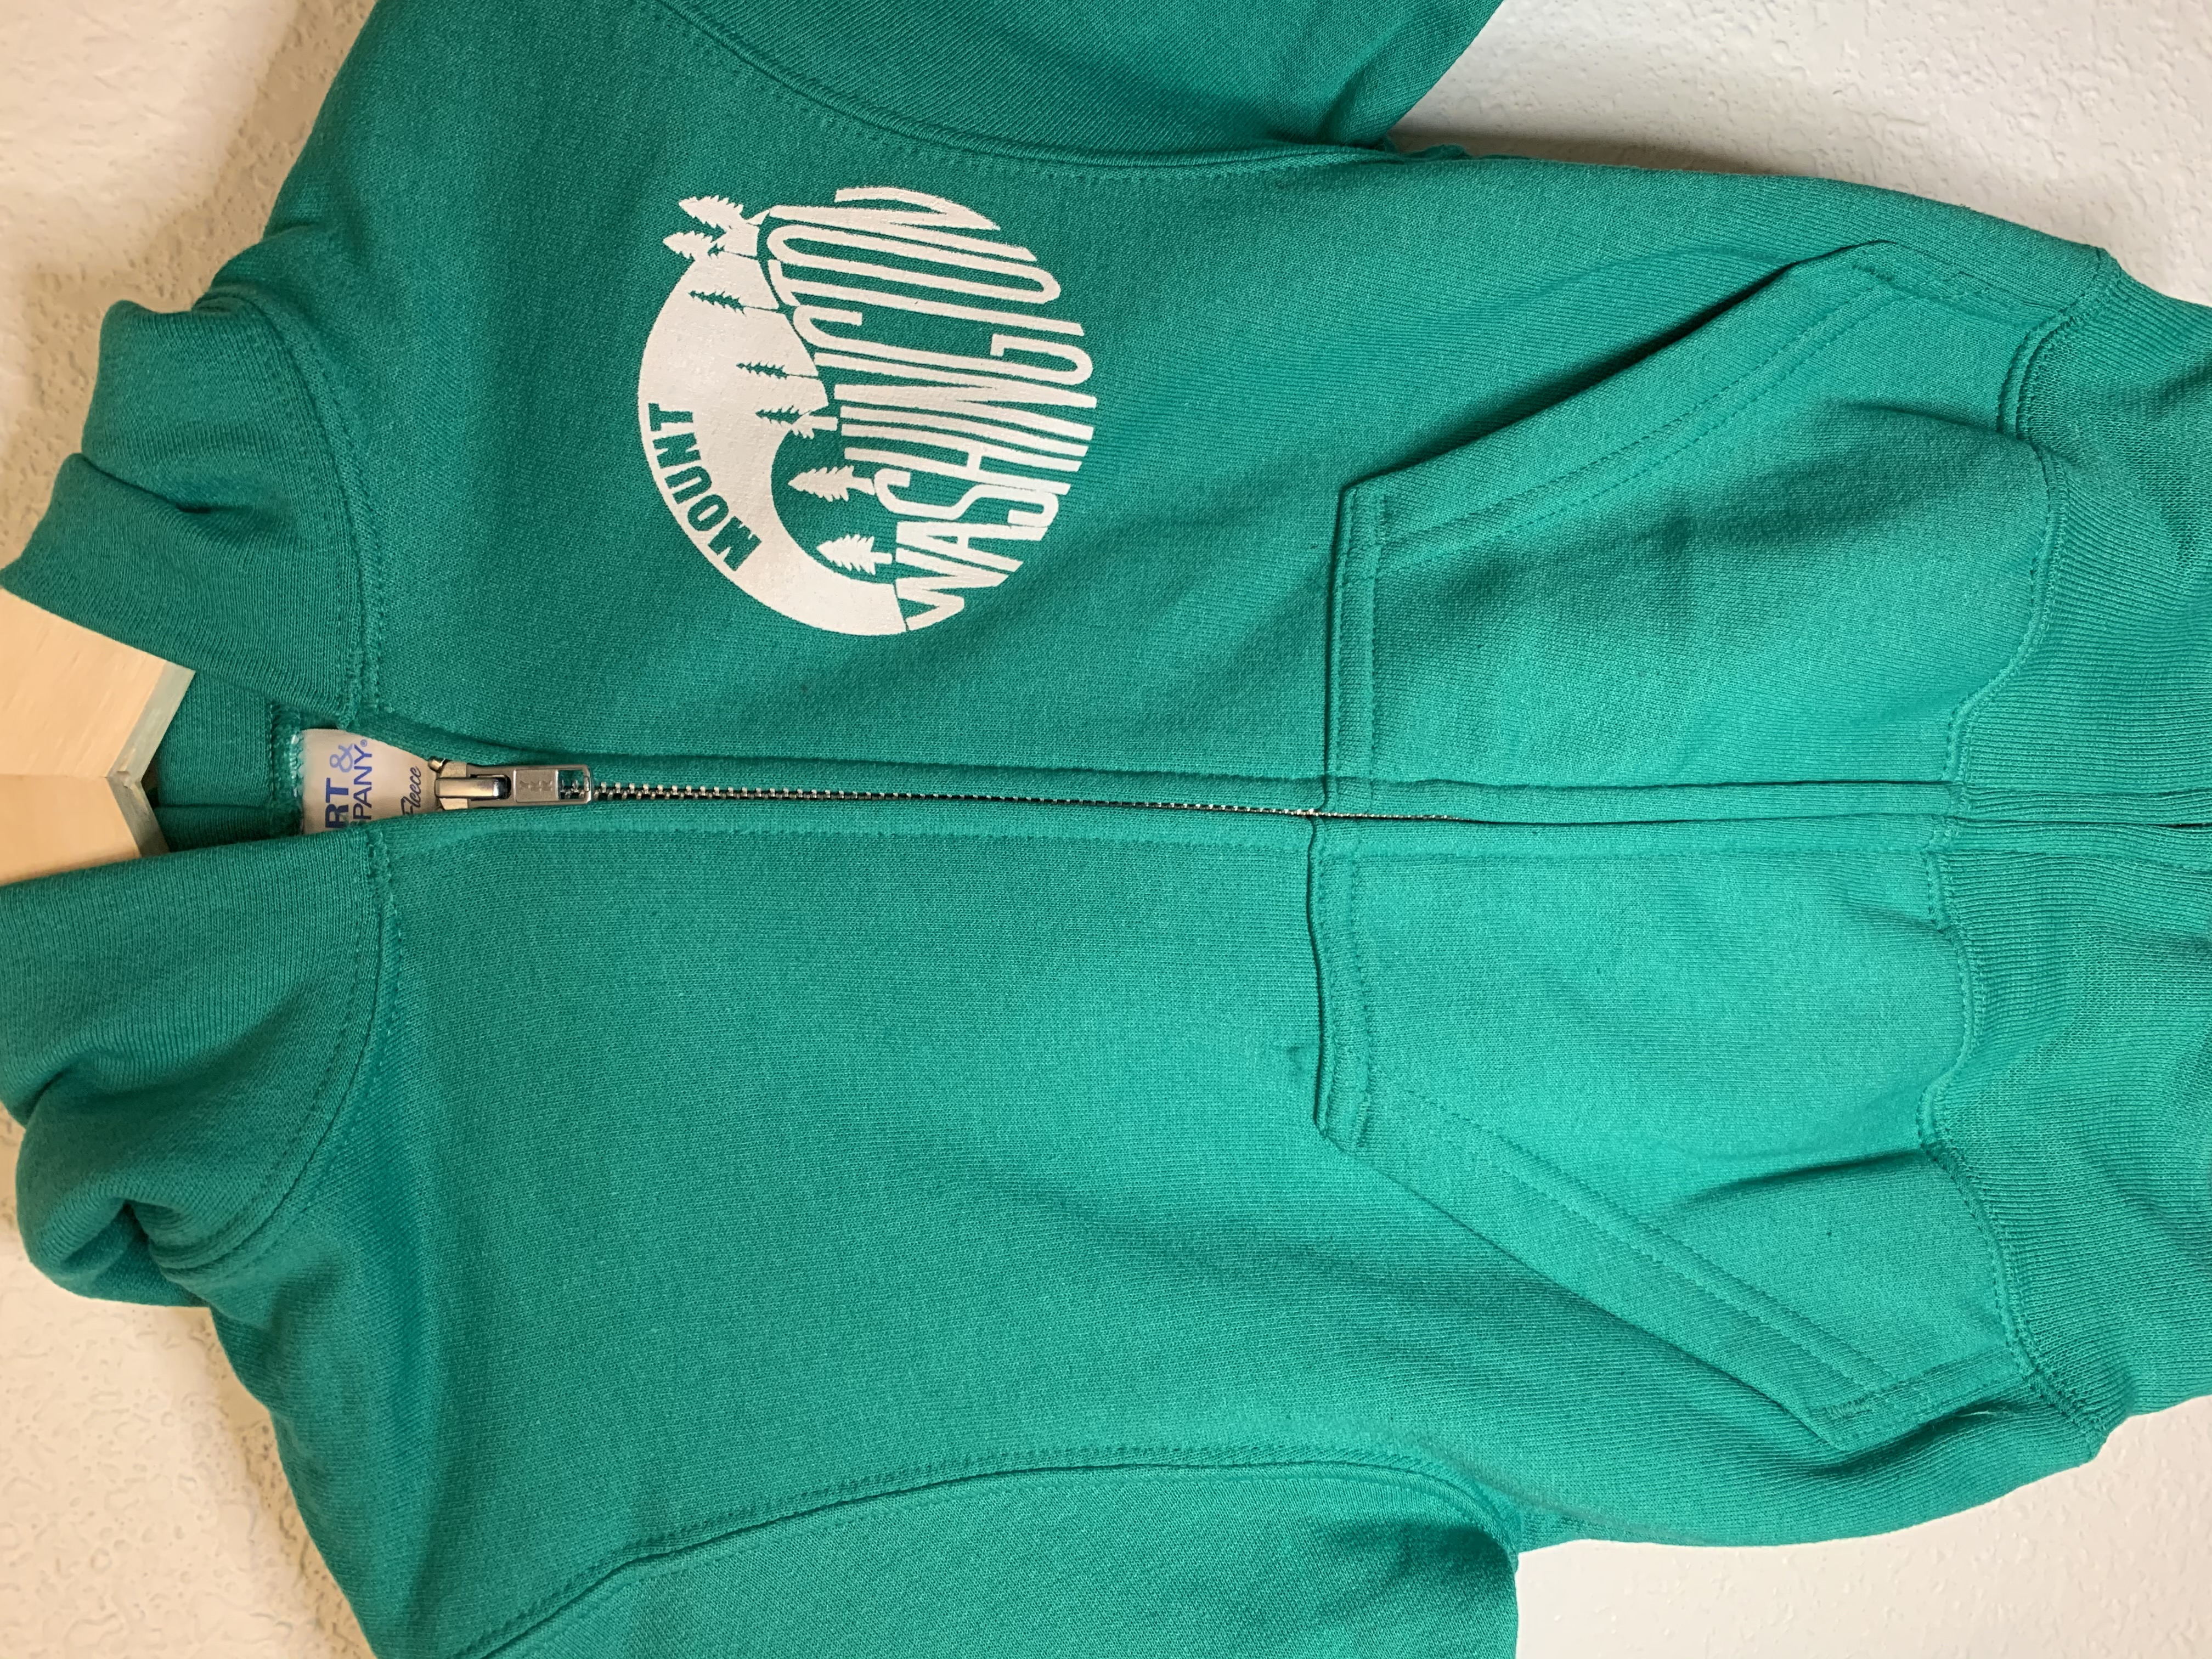 Youth Hooded Zip Sweatshirt - Kelly/White Vintage Logo